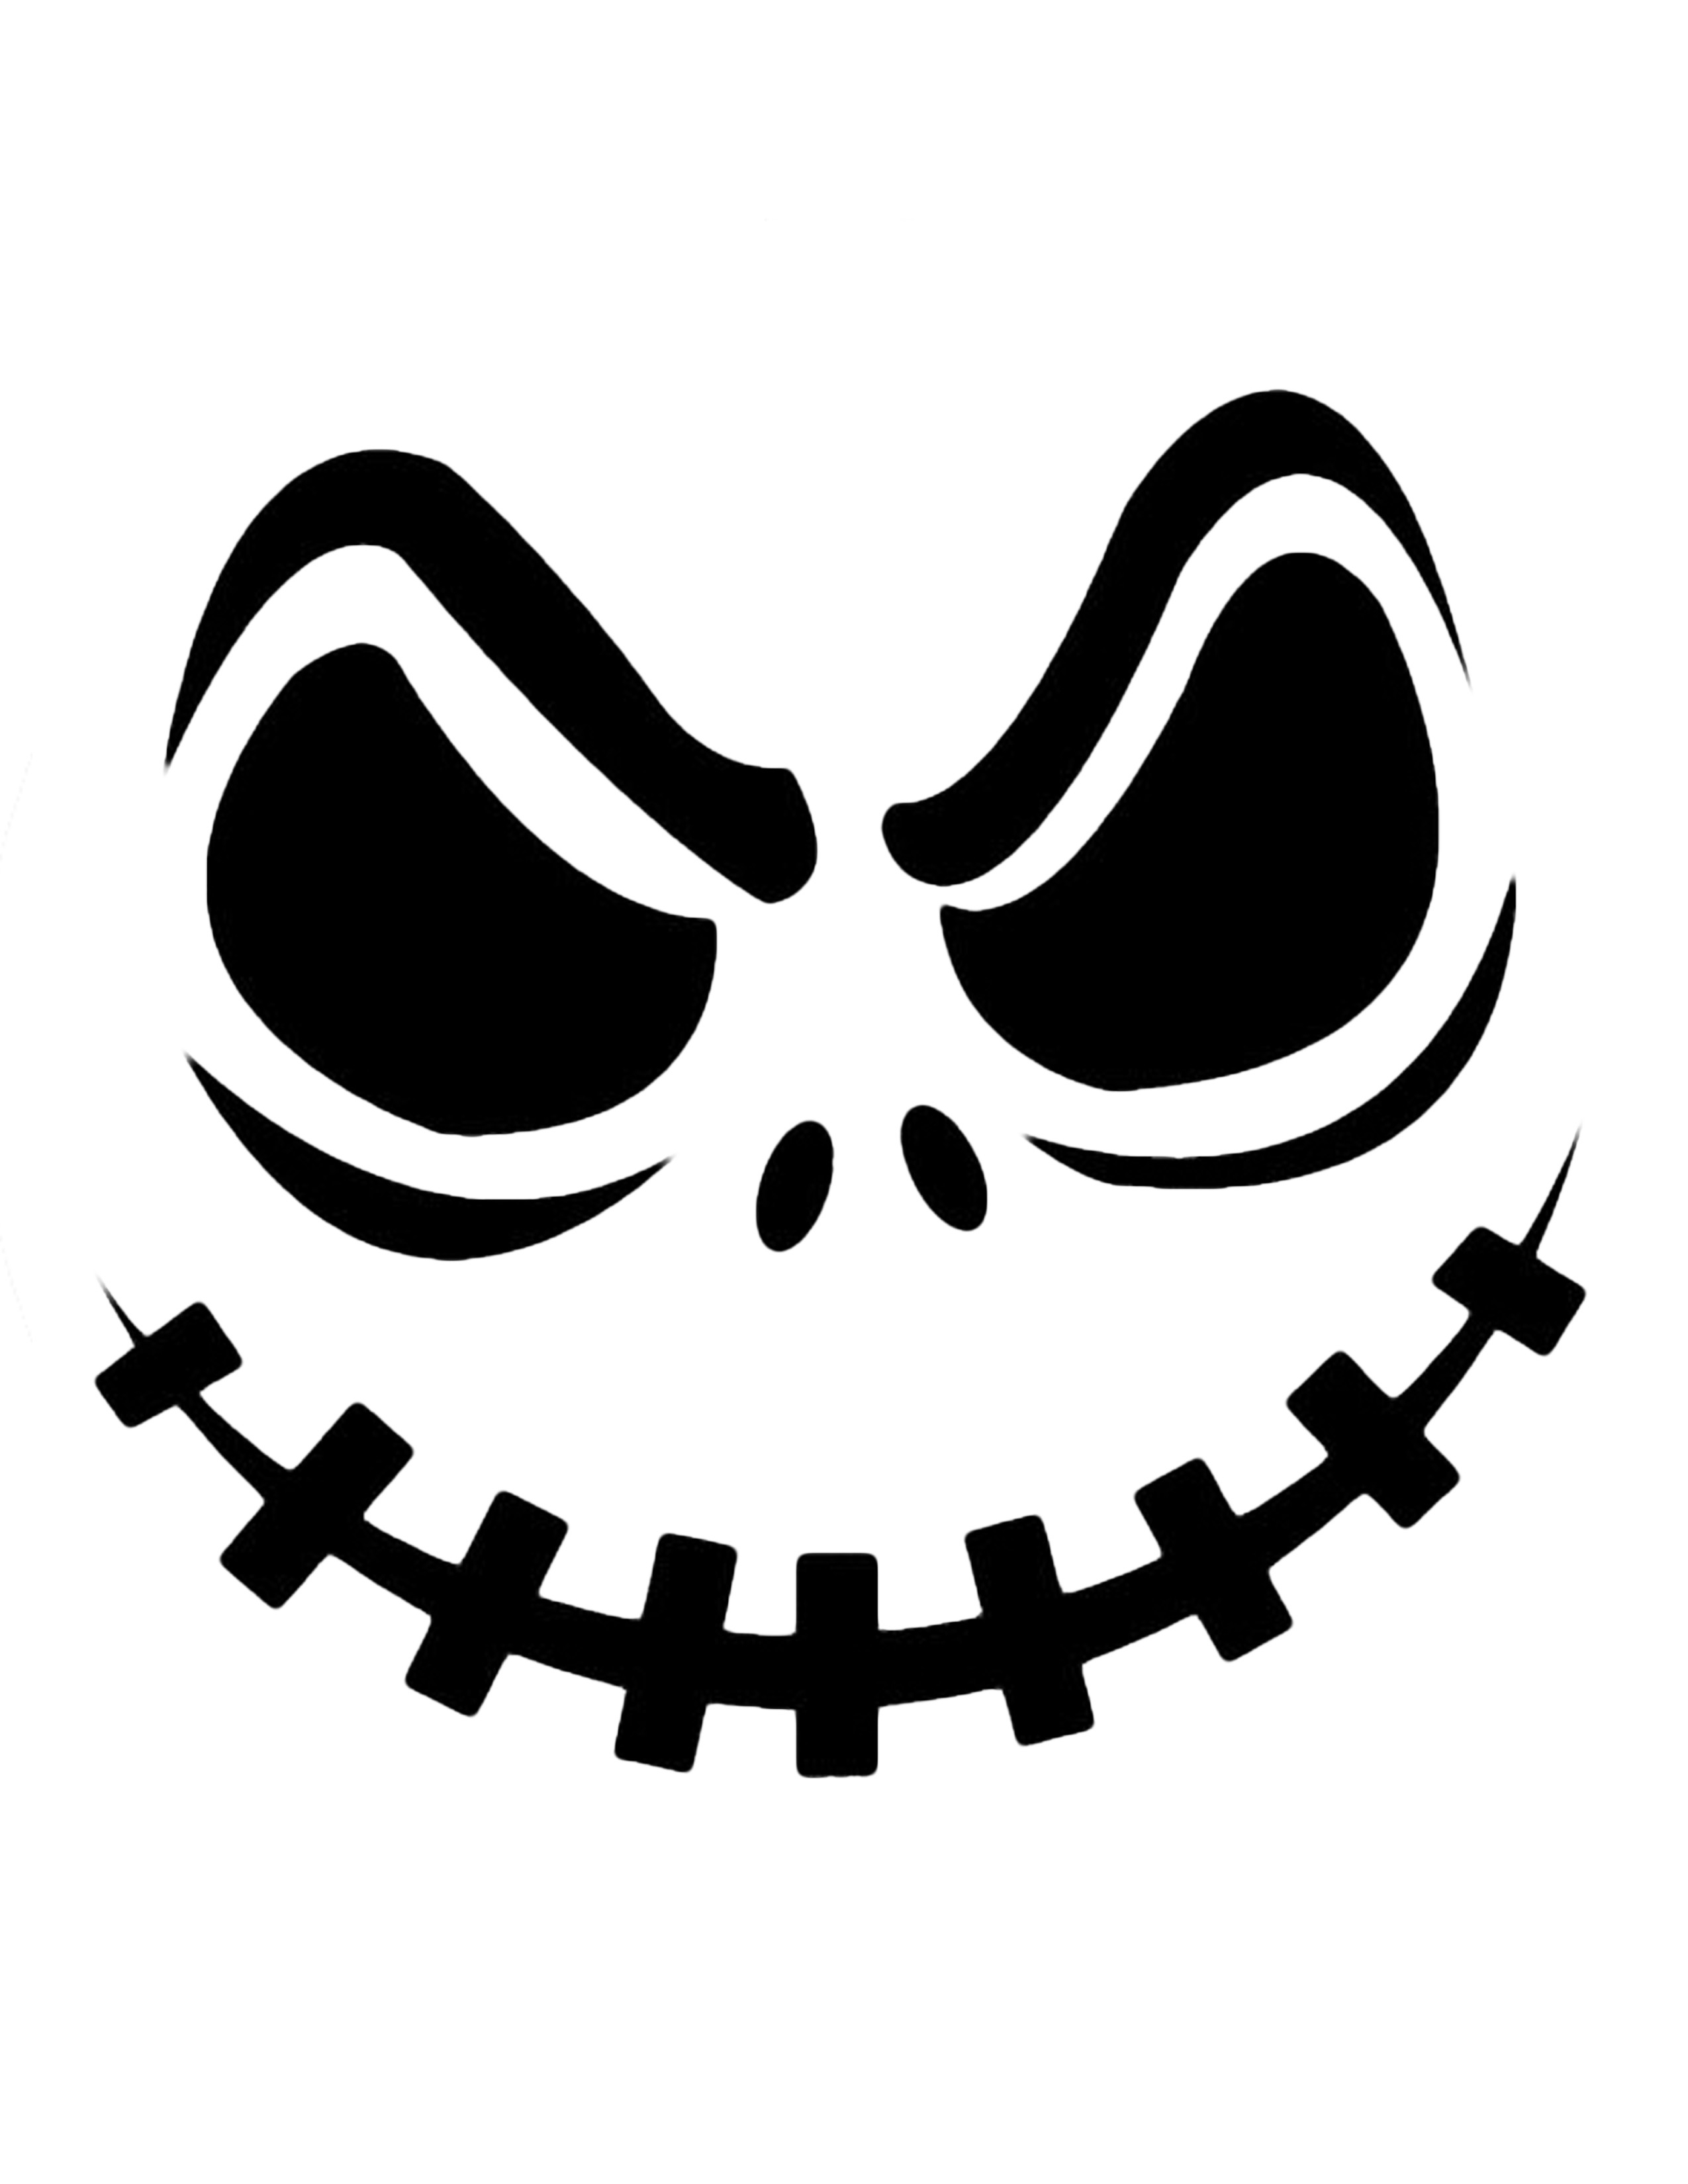 Pumpkin black and white pumpkin clipart black and white.